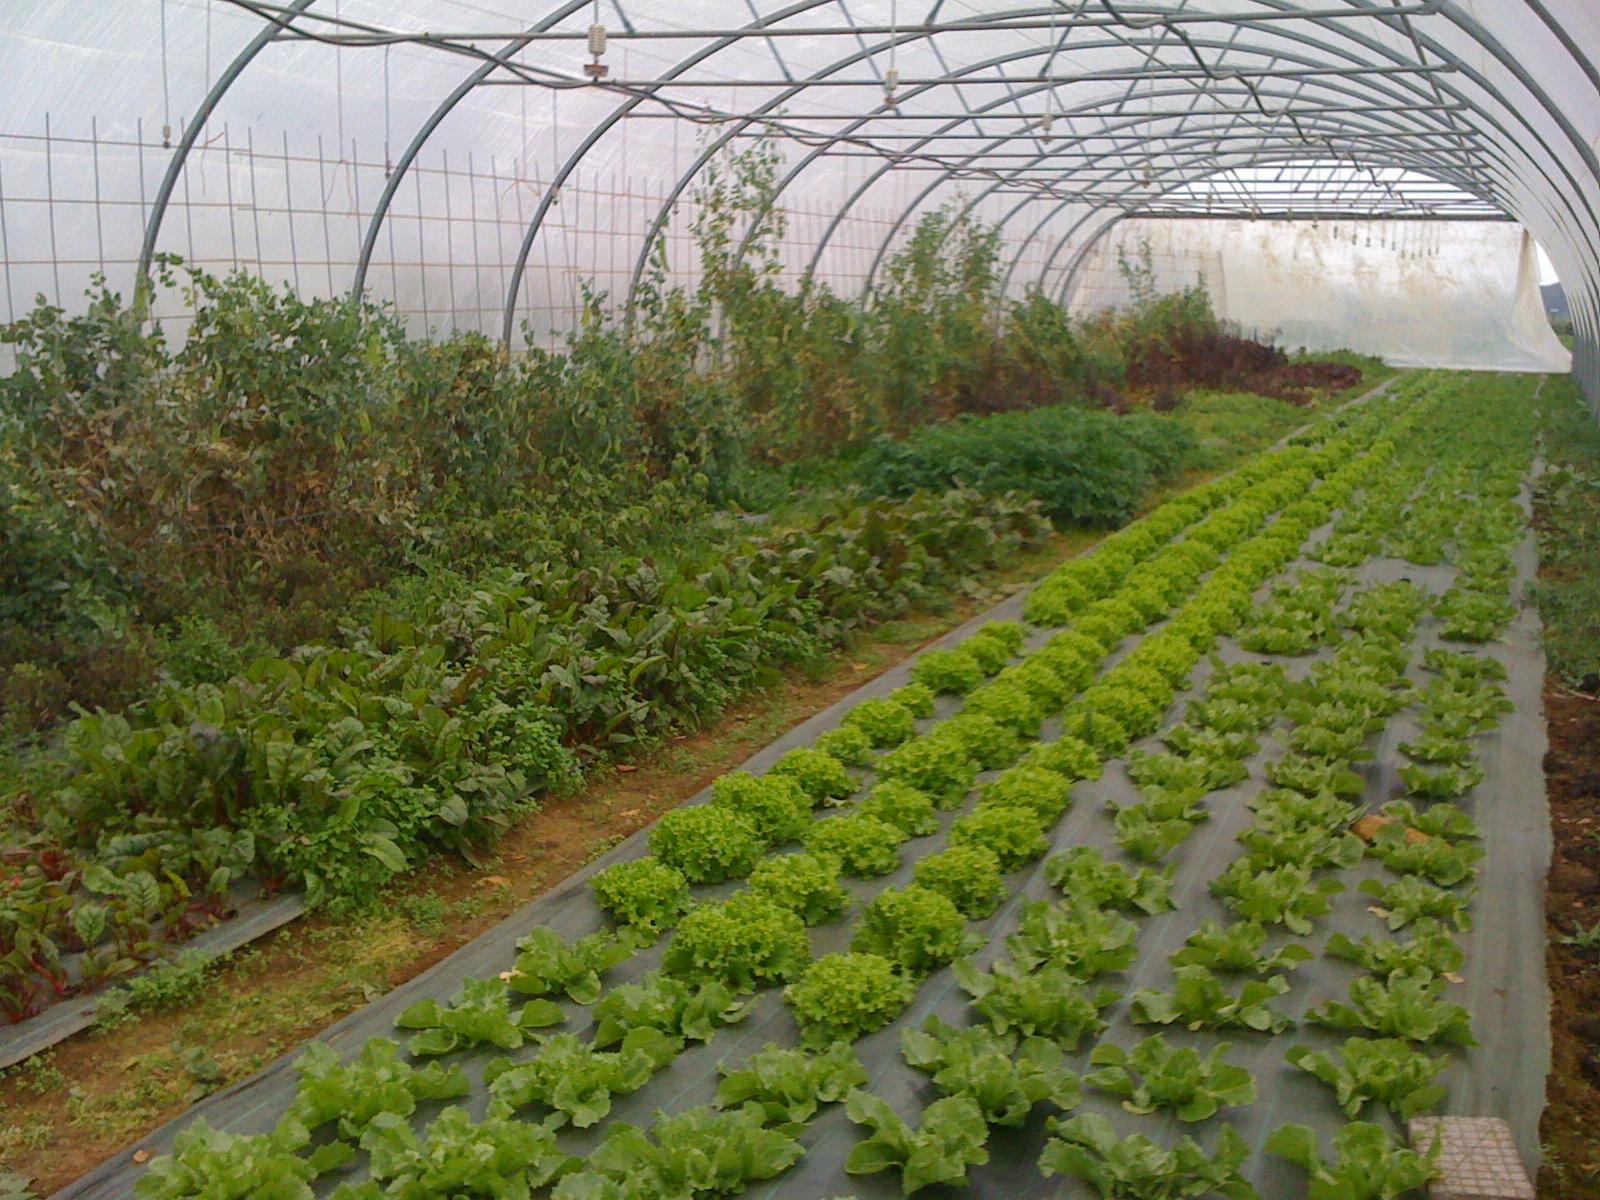 Jardin du poirier - Bettes au jardin ...